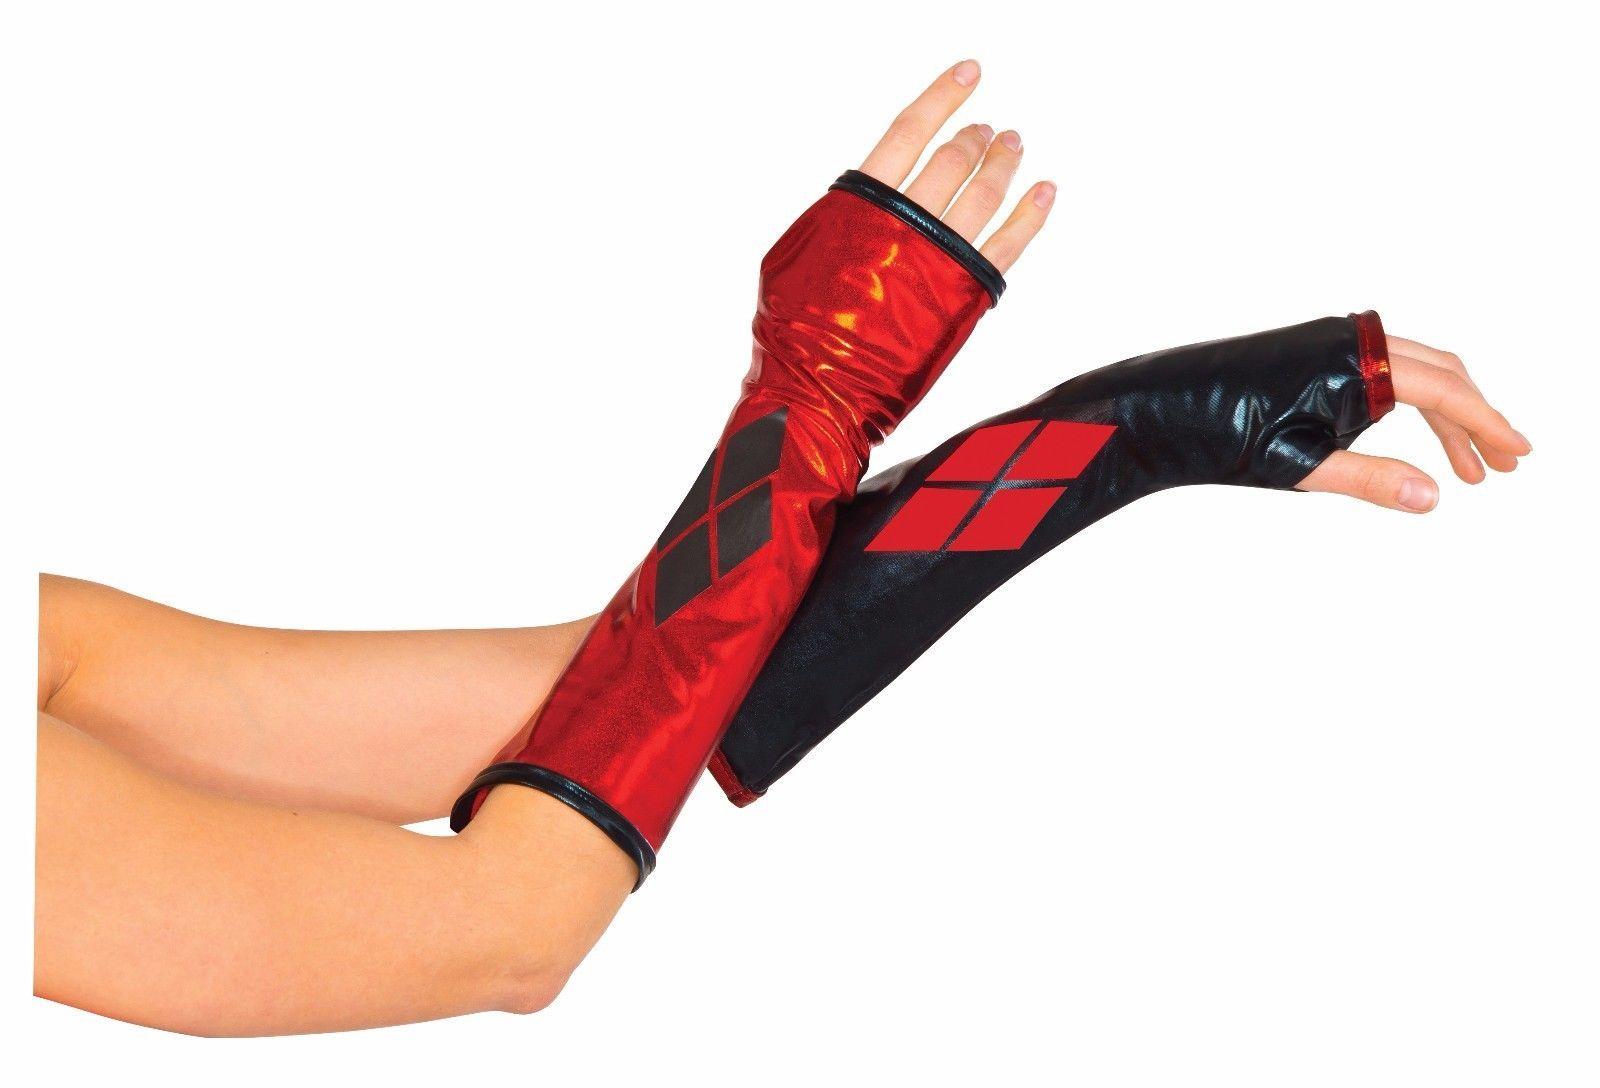 DC Comics Superhero Harley Quinn Gauntlets Accessory